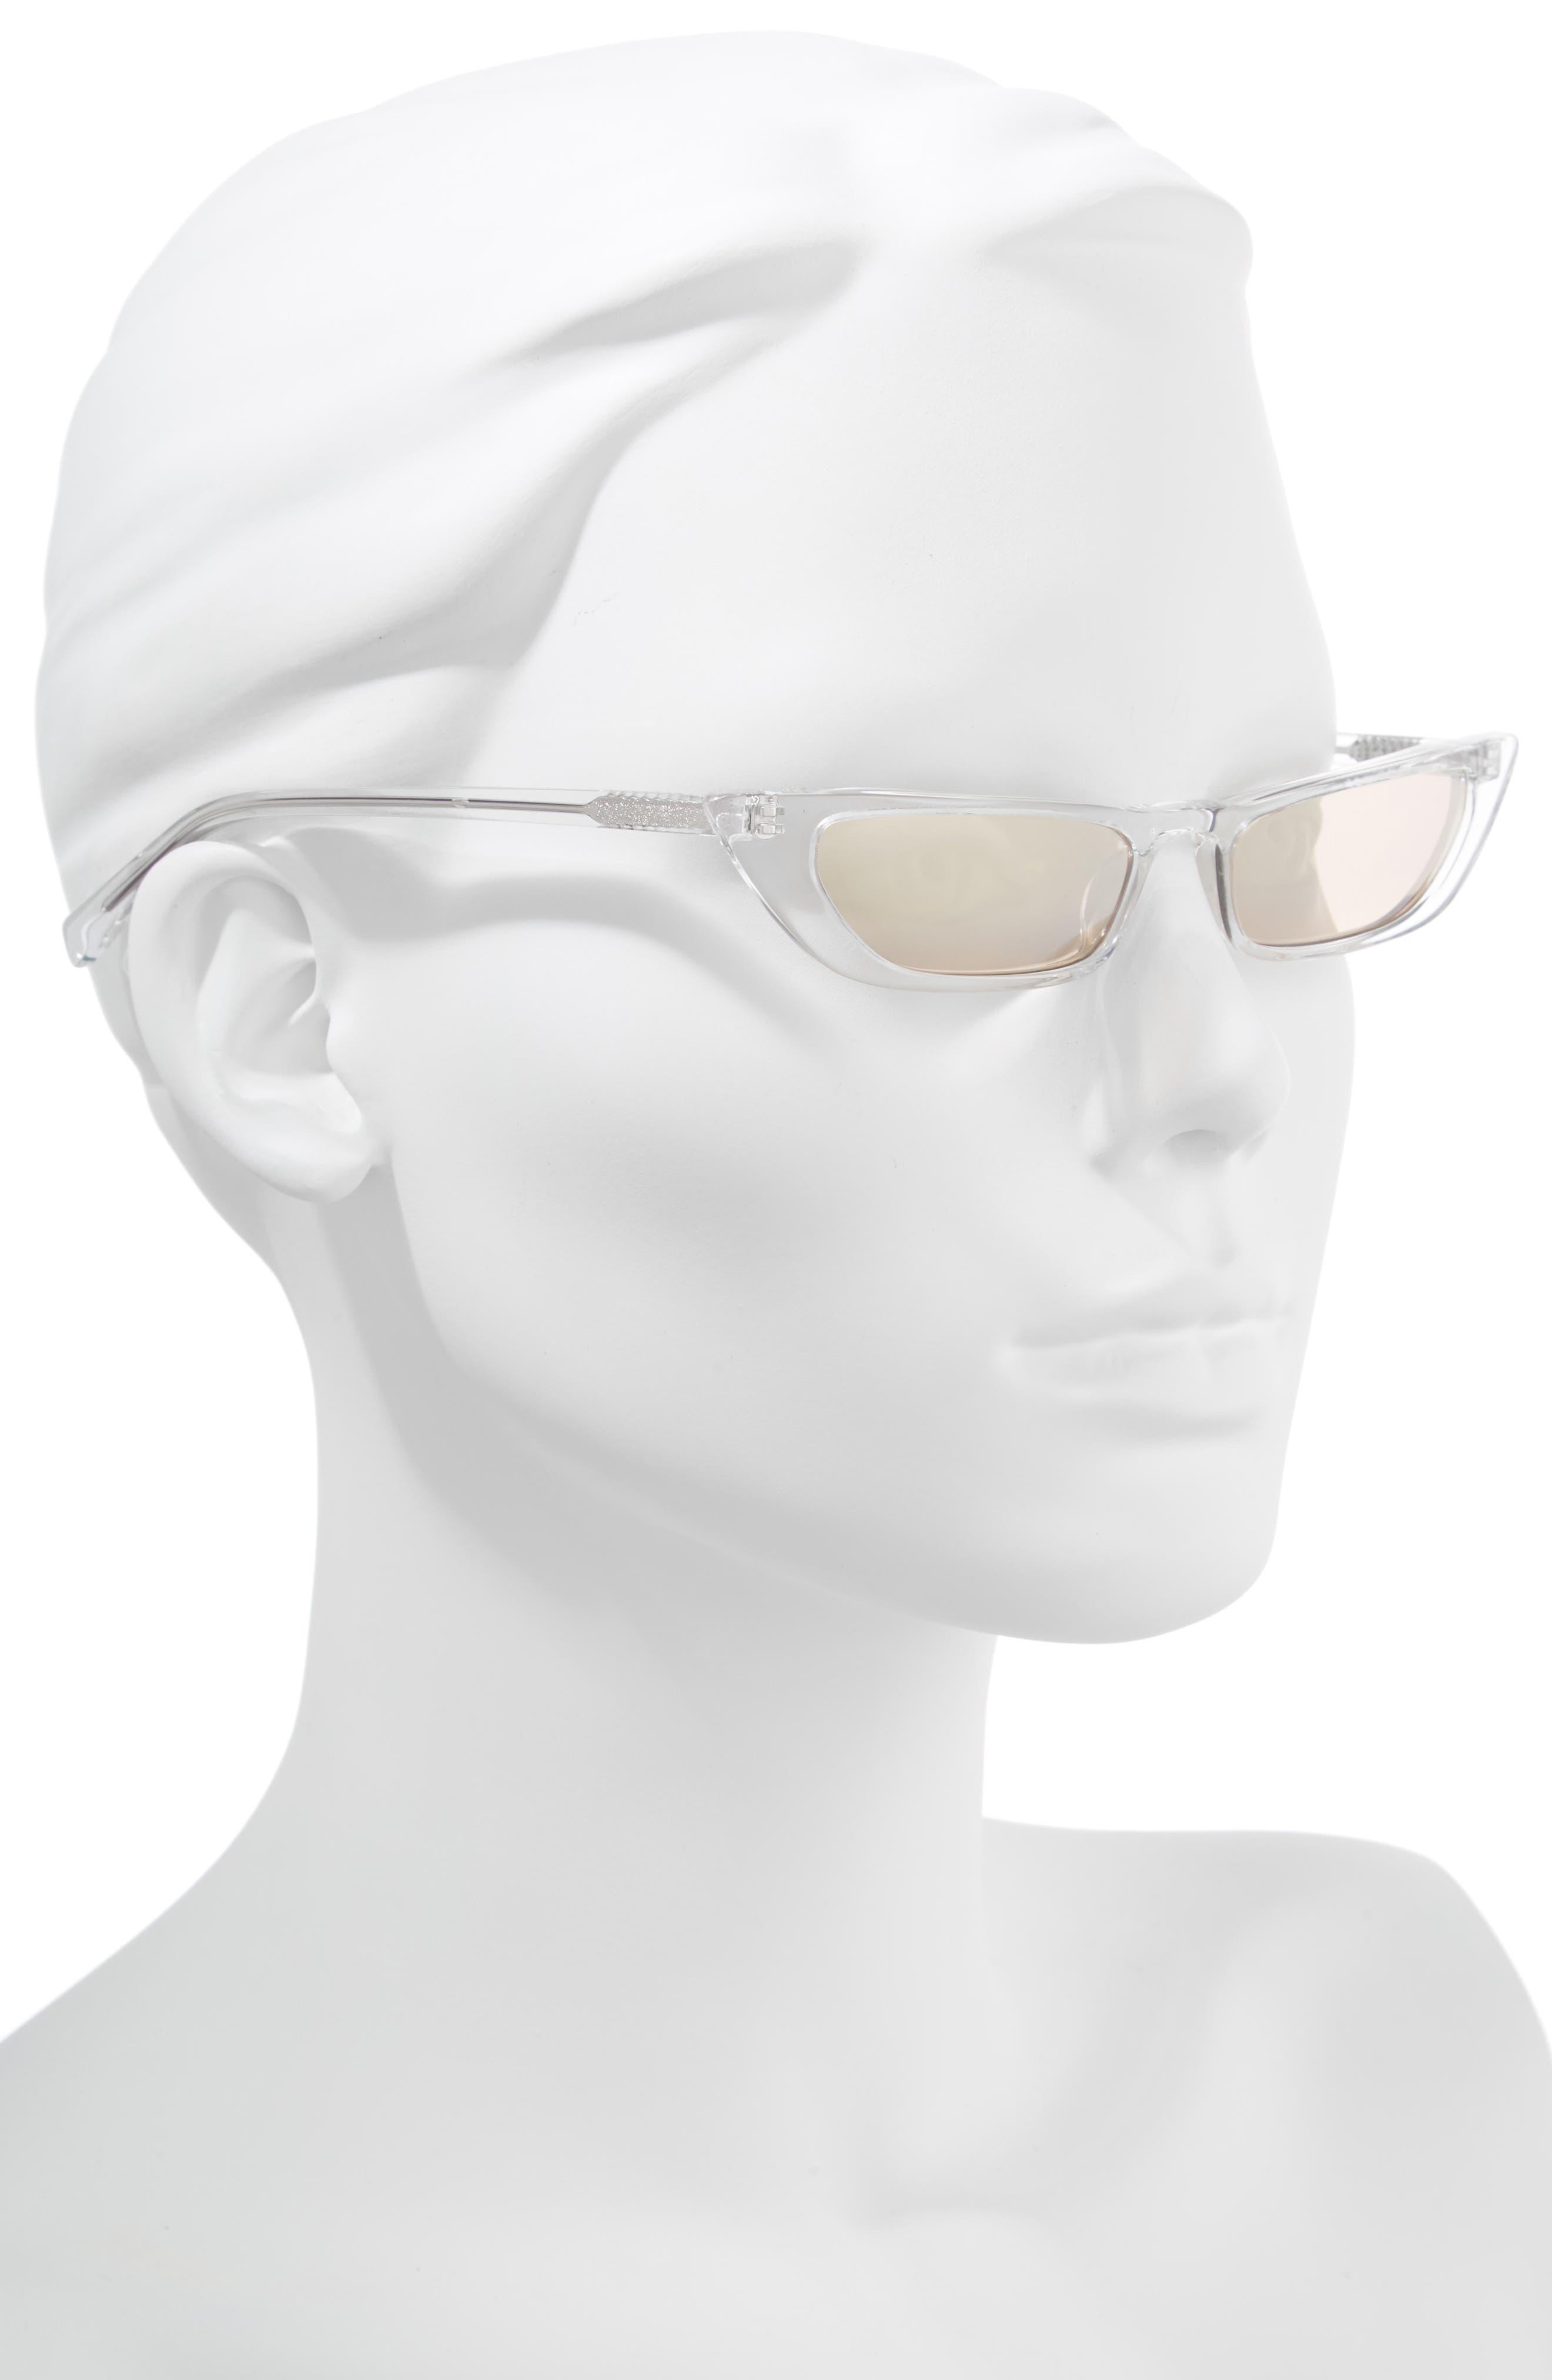 Vivian Extreme 51mm Cat Eye Sunglasses,                             Alternate thumbnail 2, color,                             Crystal/ Golden Hour Gradient